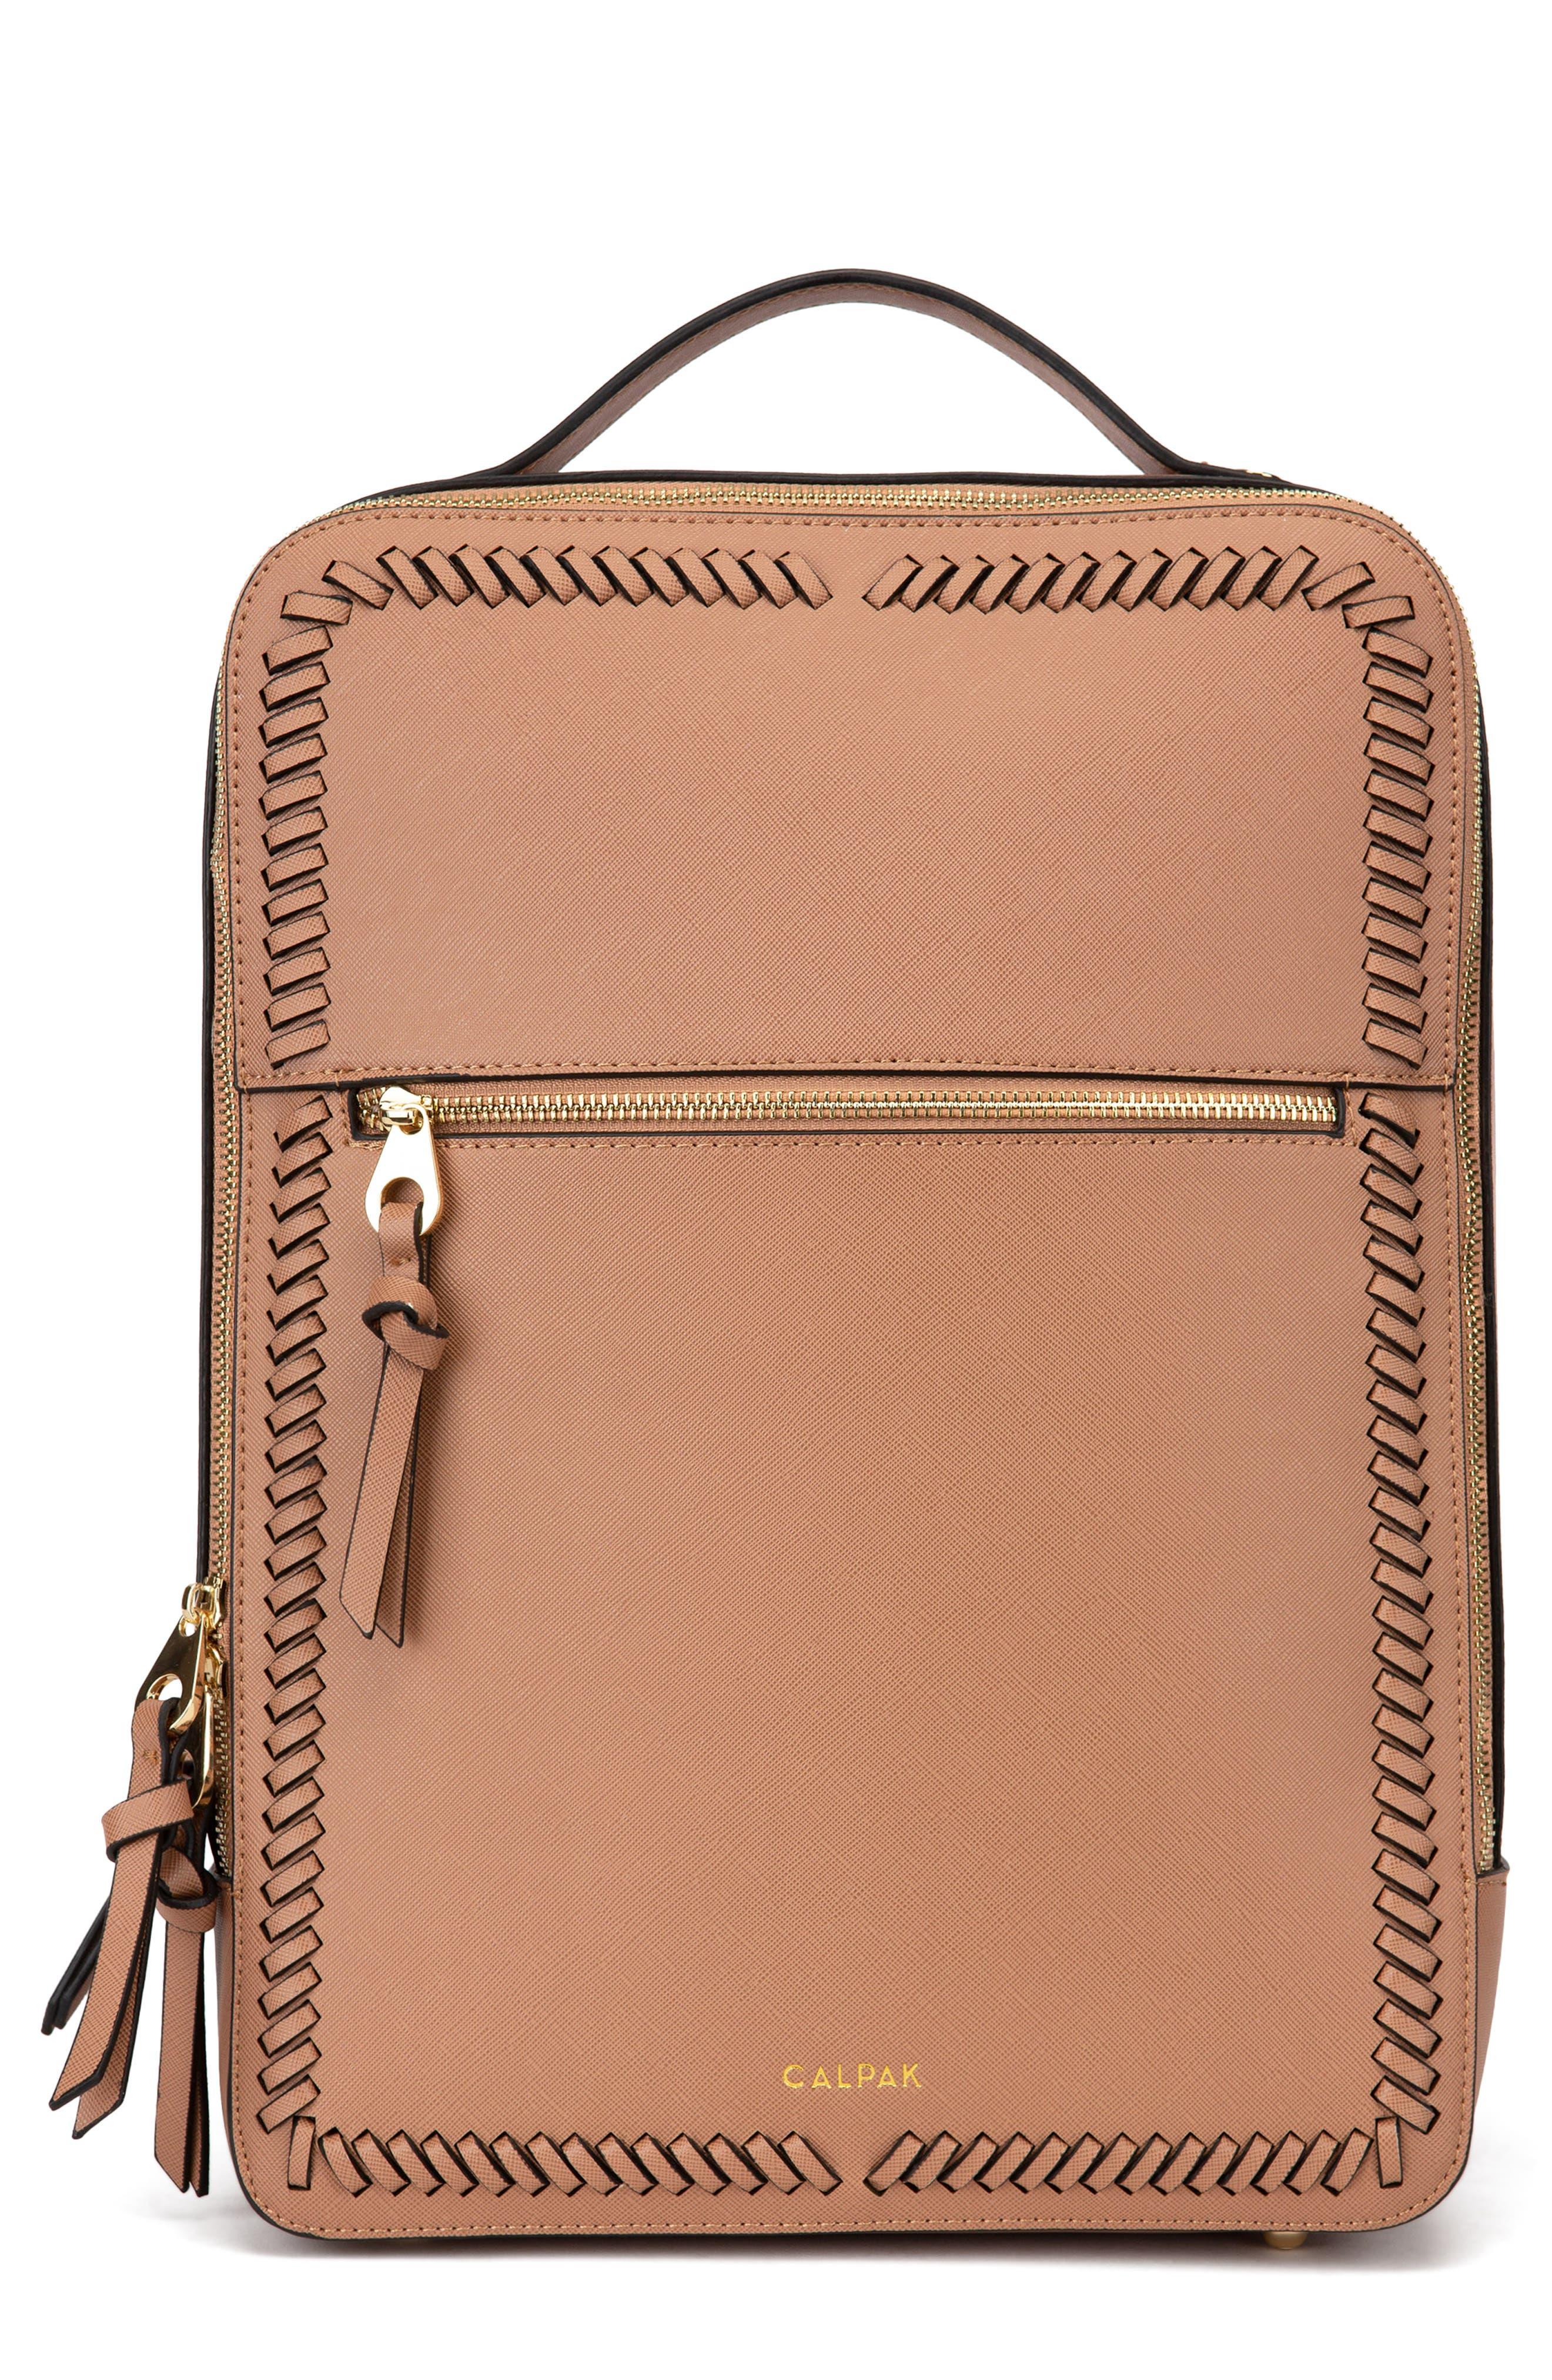 CALPAK, Kaya Faux Leather Laptop Backpack, Main thumbnail 1, color, CARAMEL